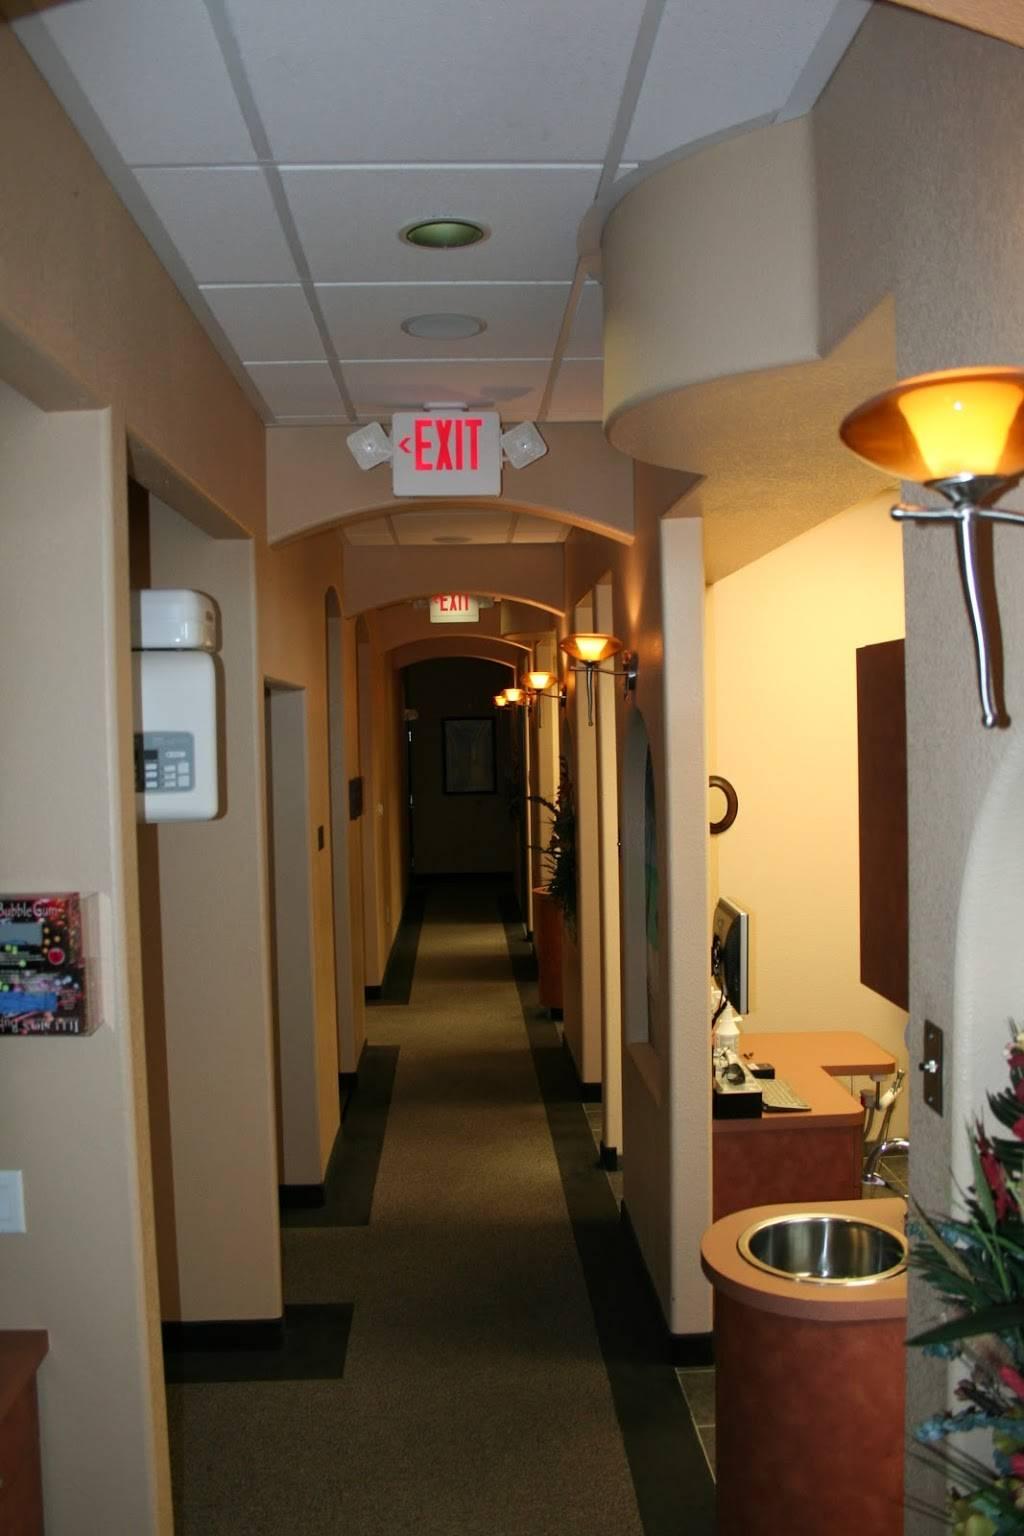 Hidy Stavarache, D.D.S., Ltd. - dentist  | Photo 3 of 3 | Address: 9910 W Cheyenne Ave #170, Las Vegas, NV 89129, USA | Phone: (702) 233-8371